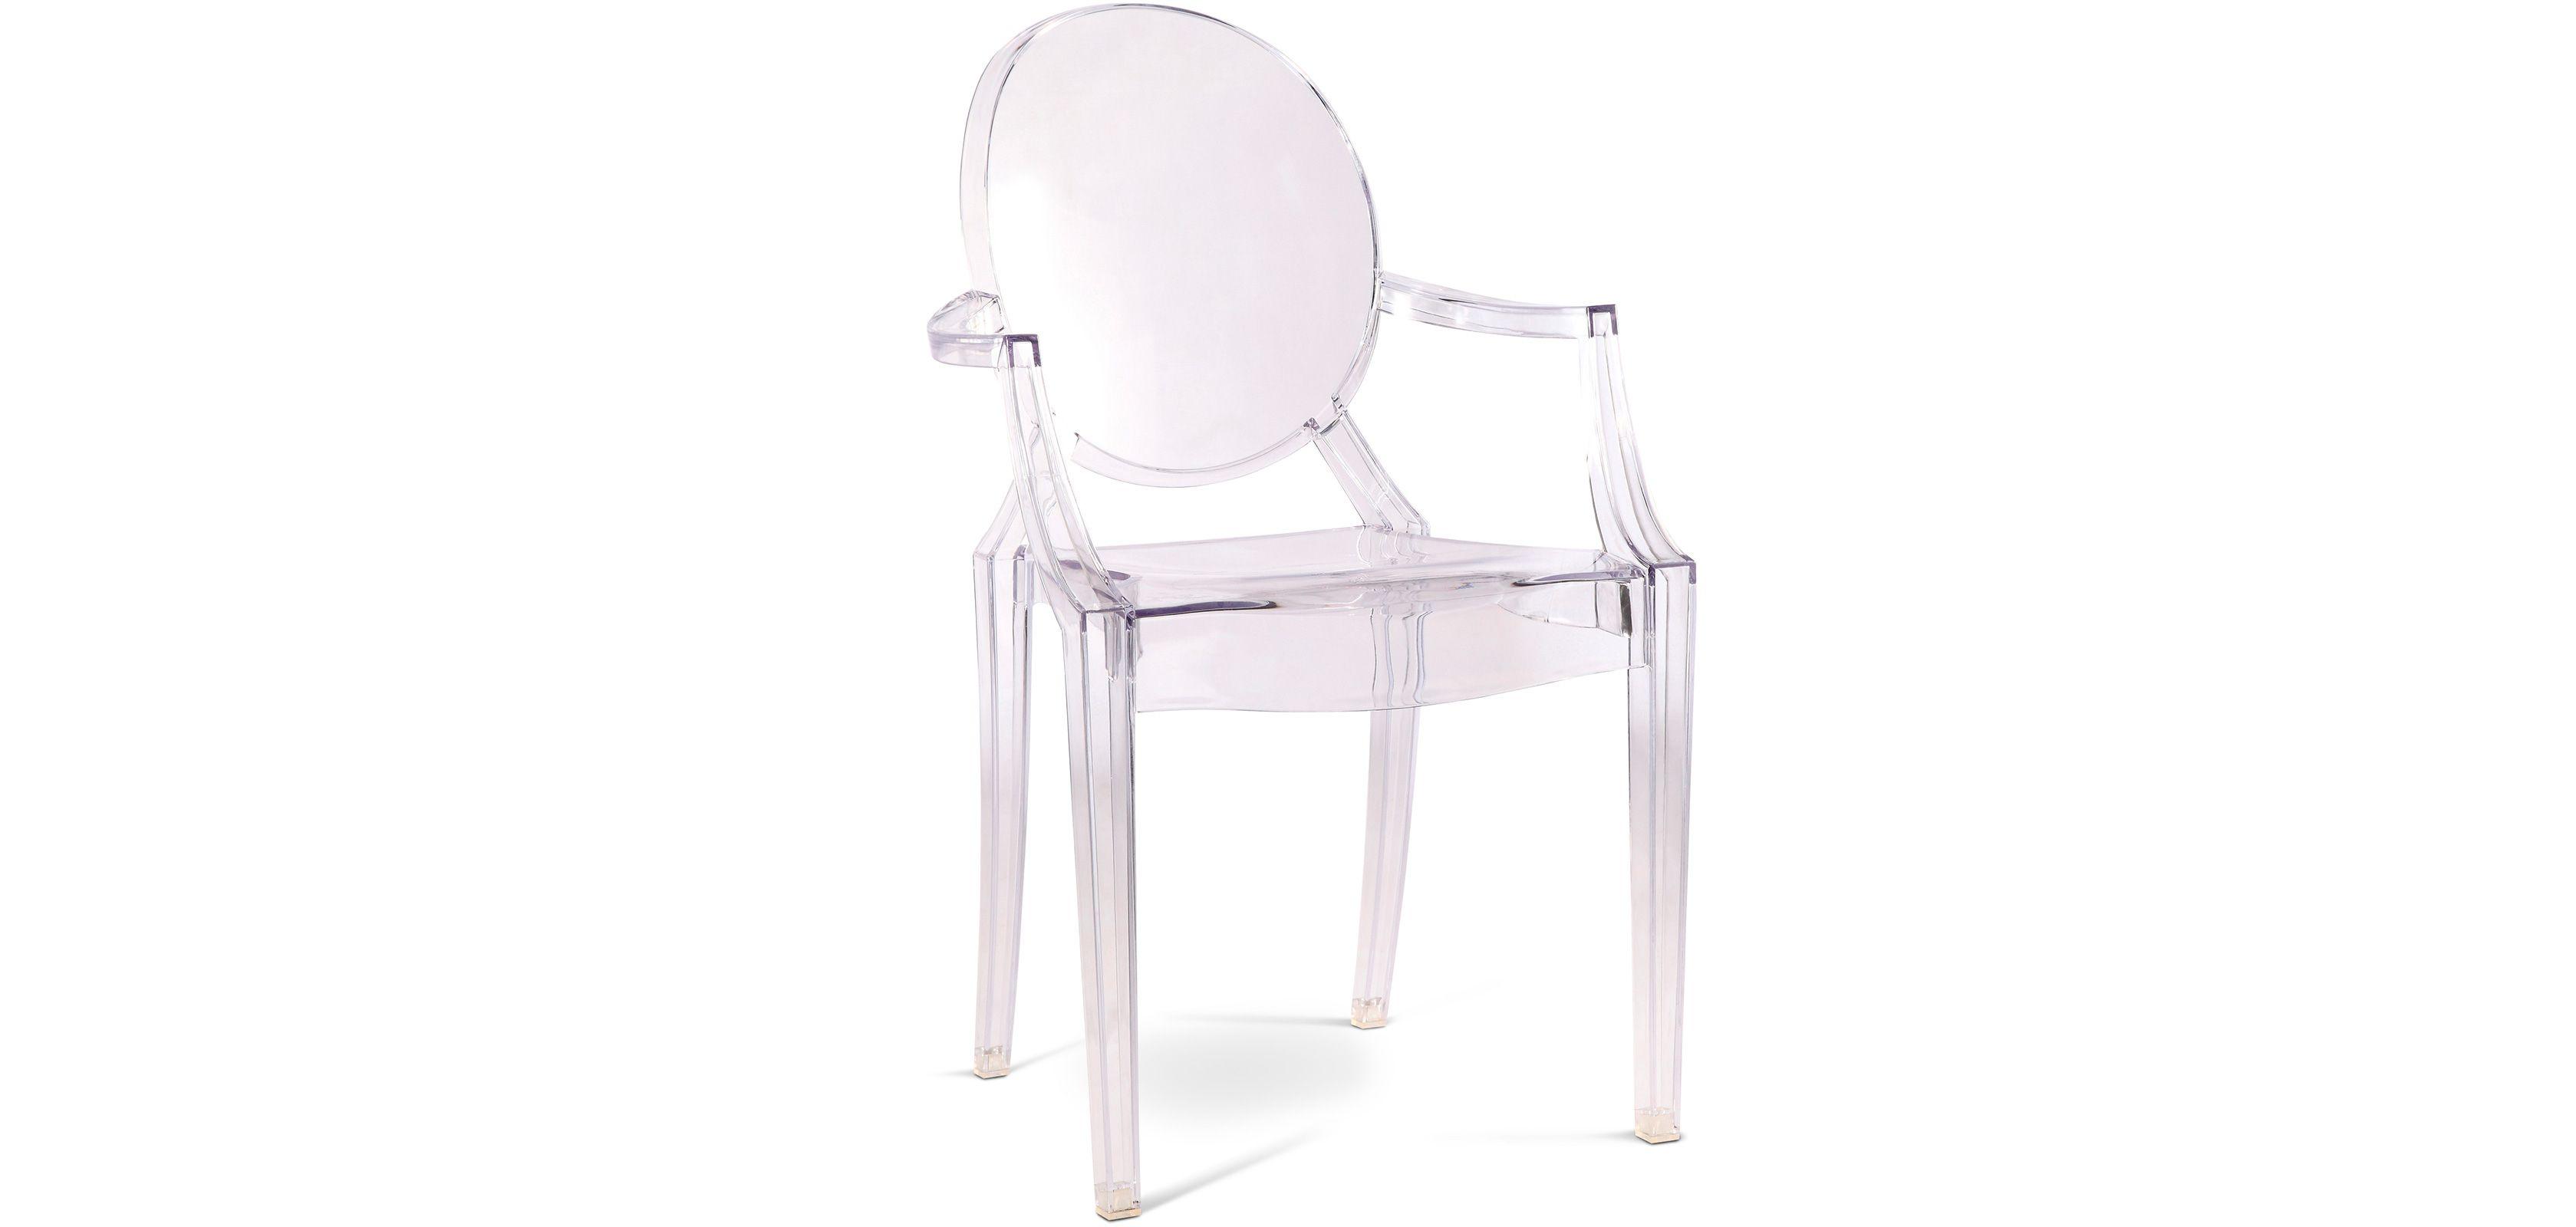 Fauteuil Louis Ghost De Philippe Starck fauteuil style louis ghost - inspiré philippe s.